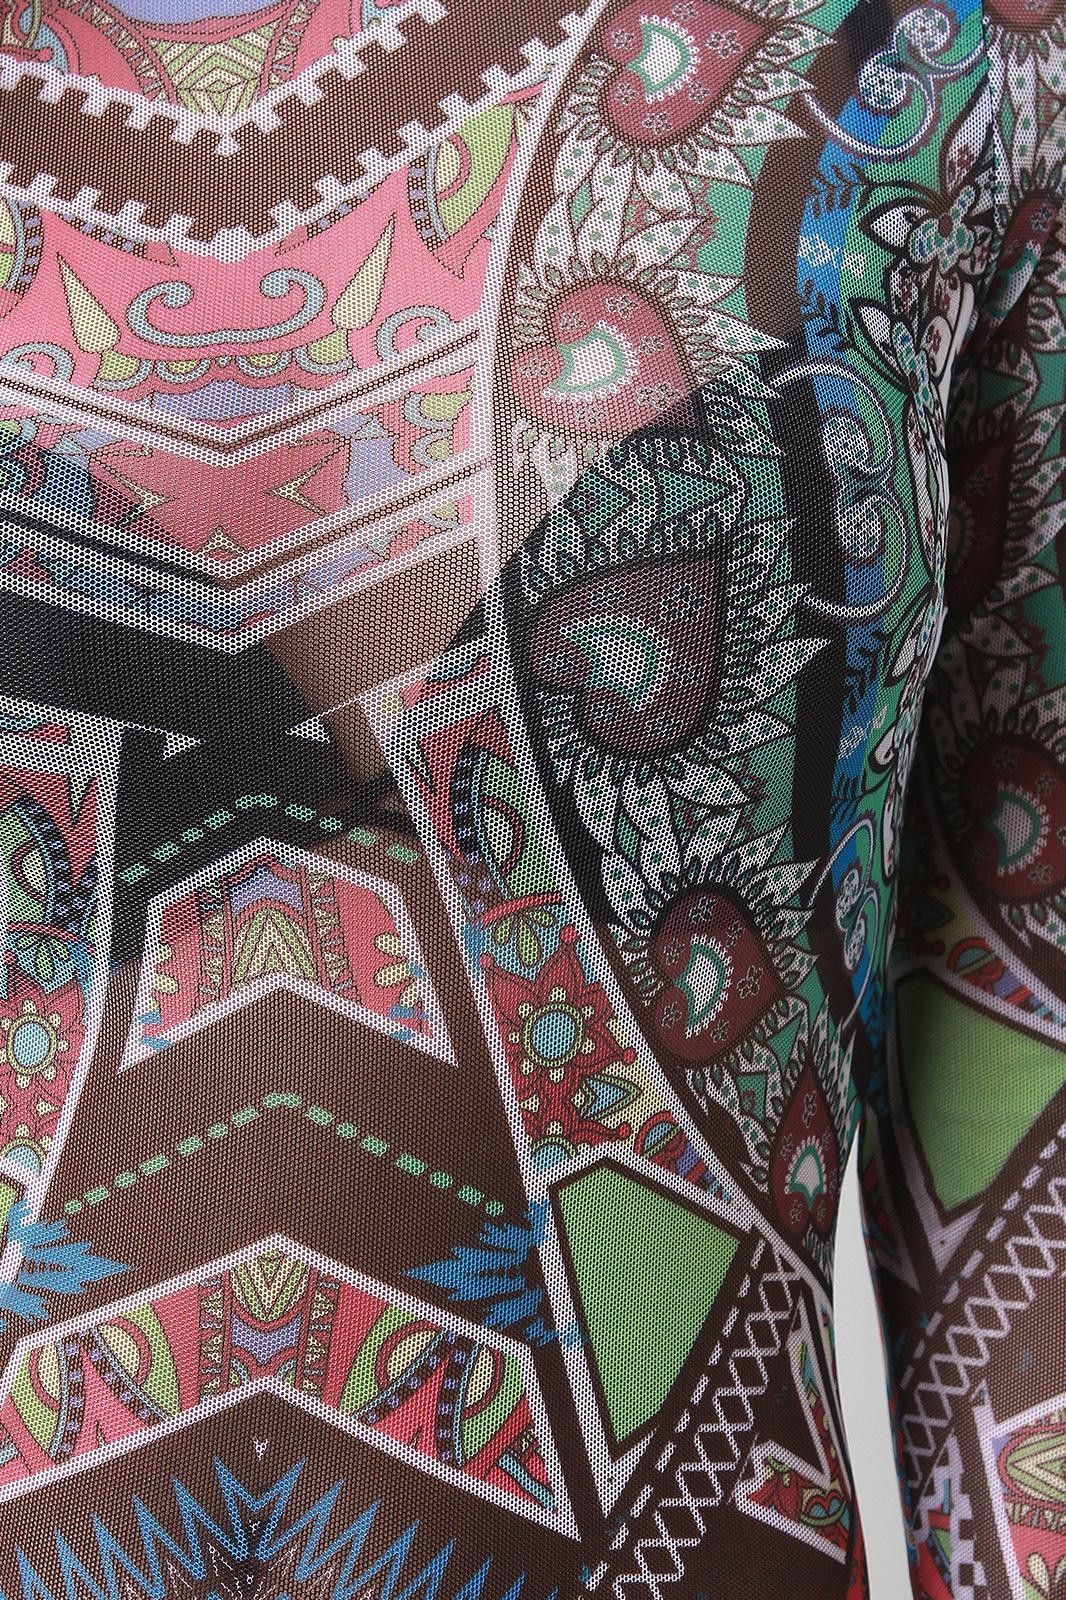 Abstract Boho Mesh Bodycon Dress